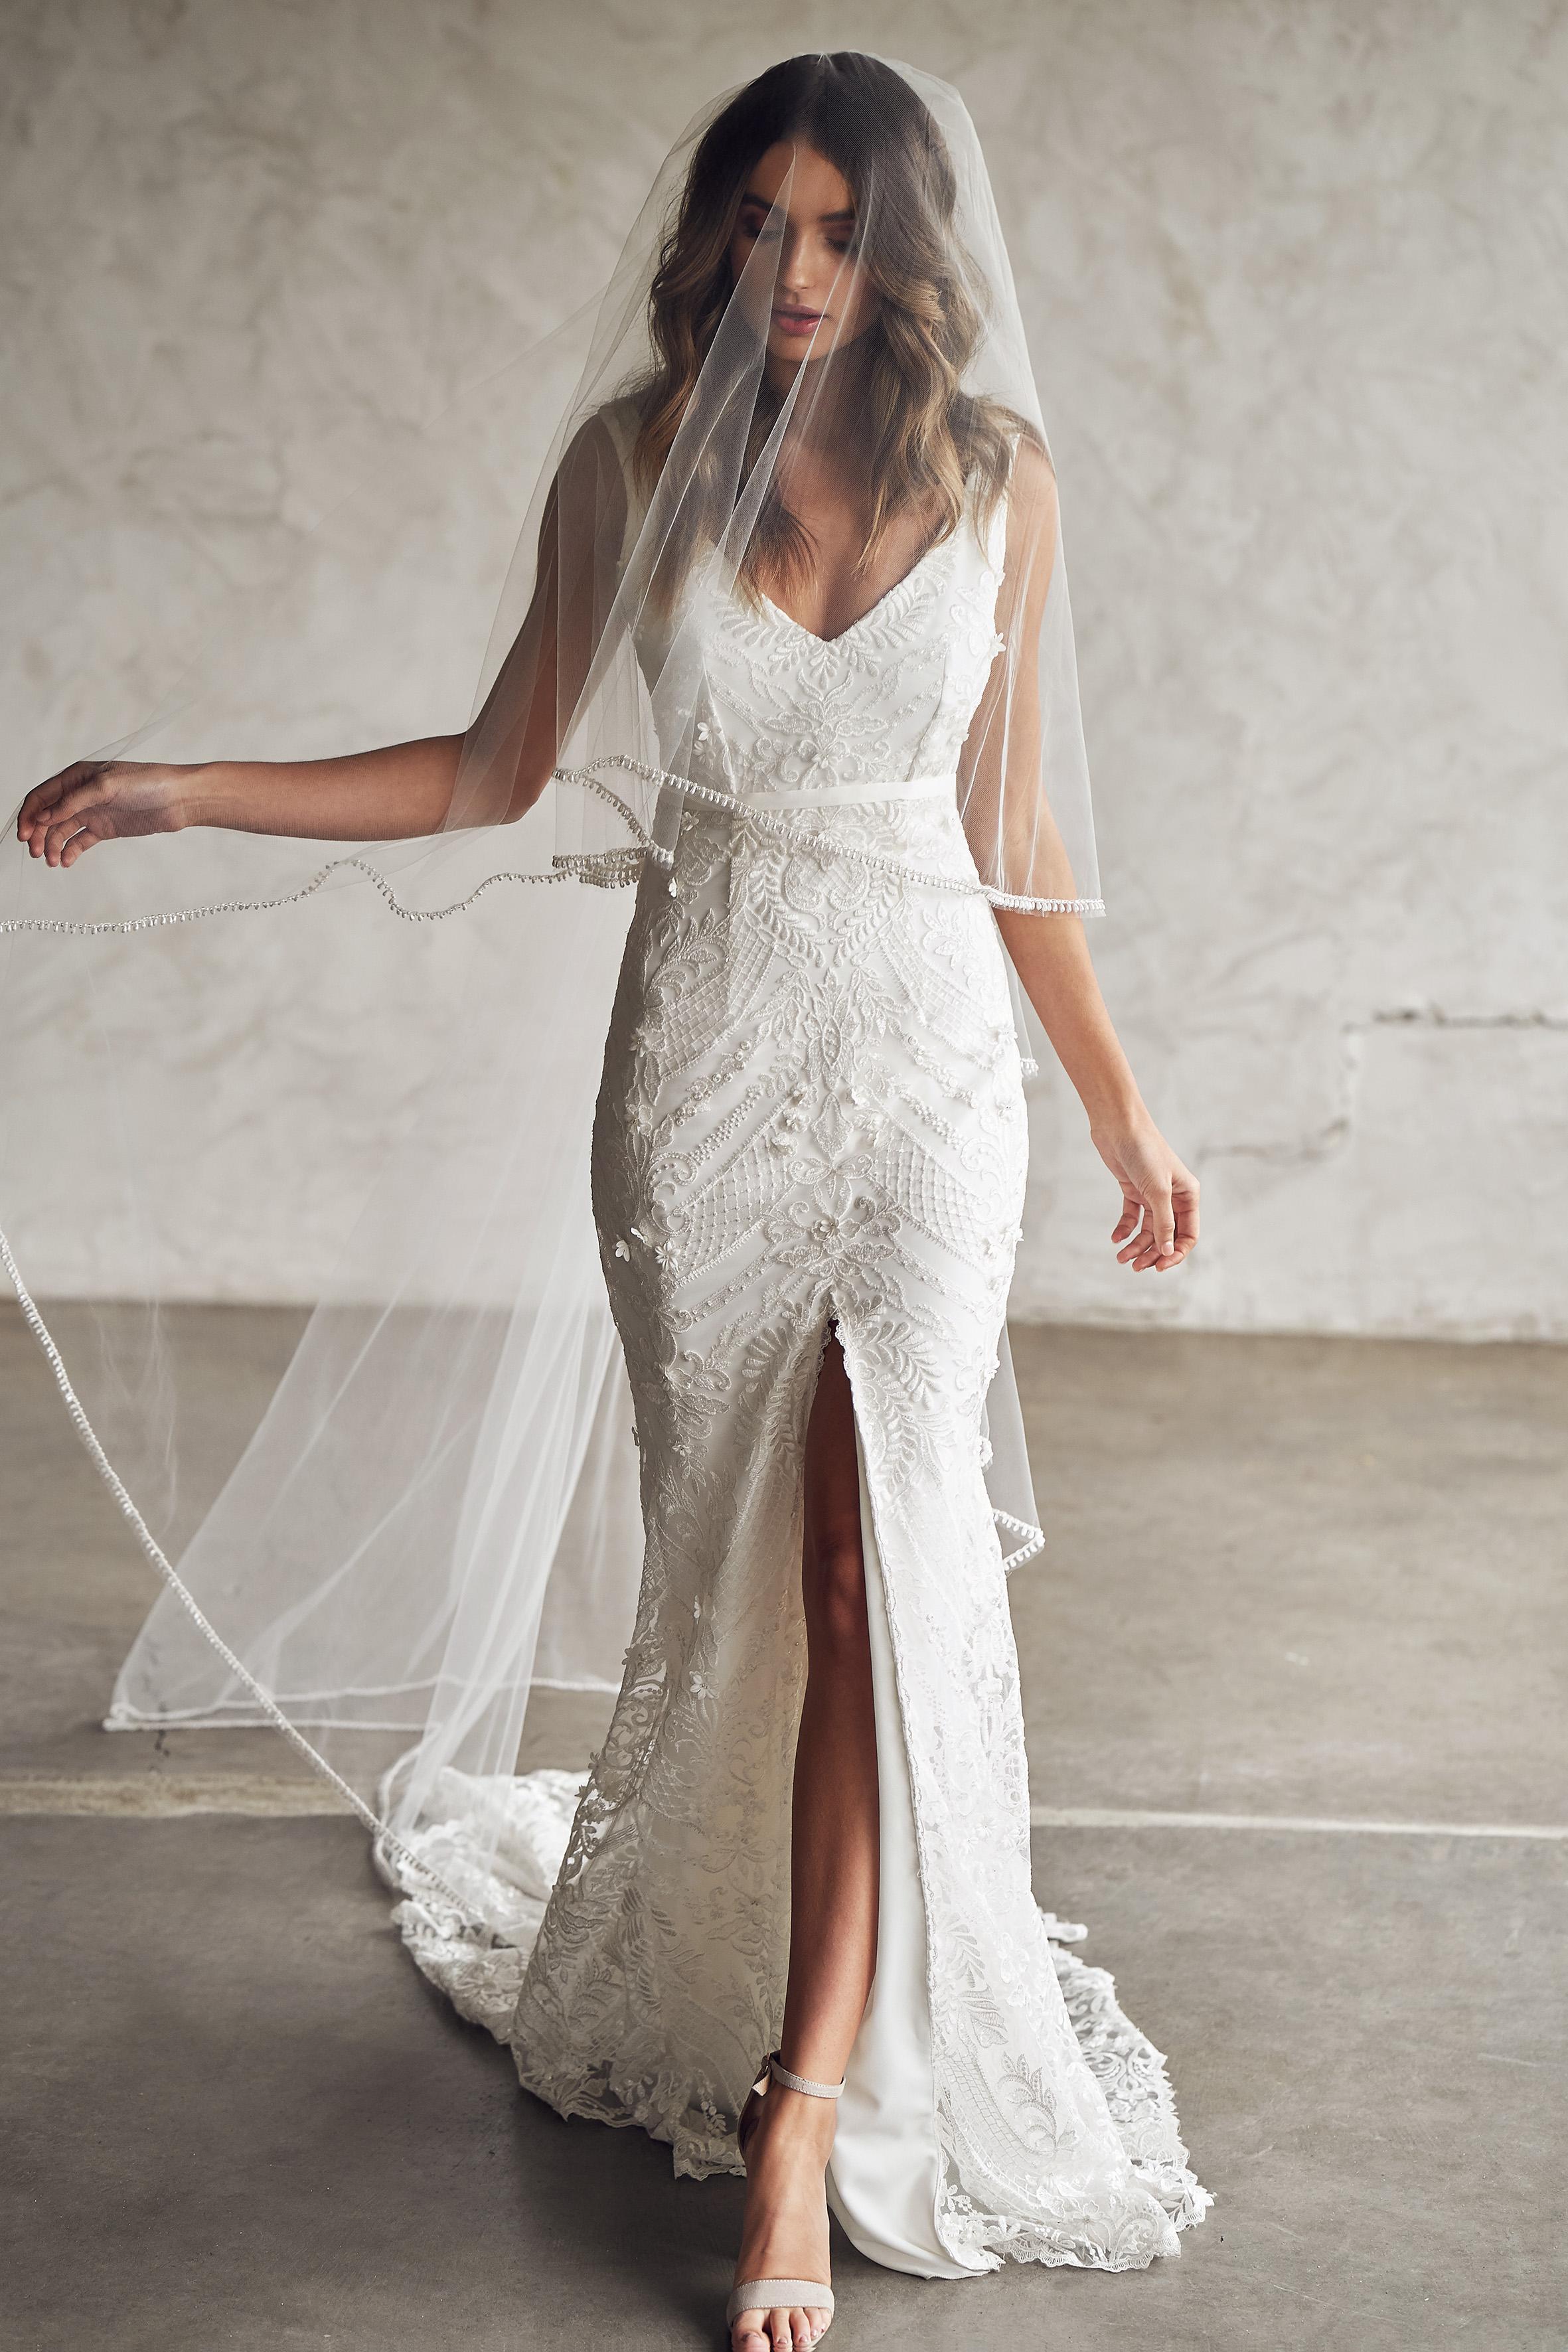 DRESS | lexi ELM